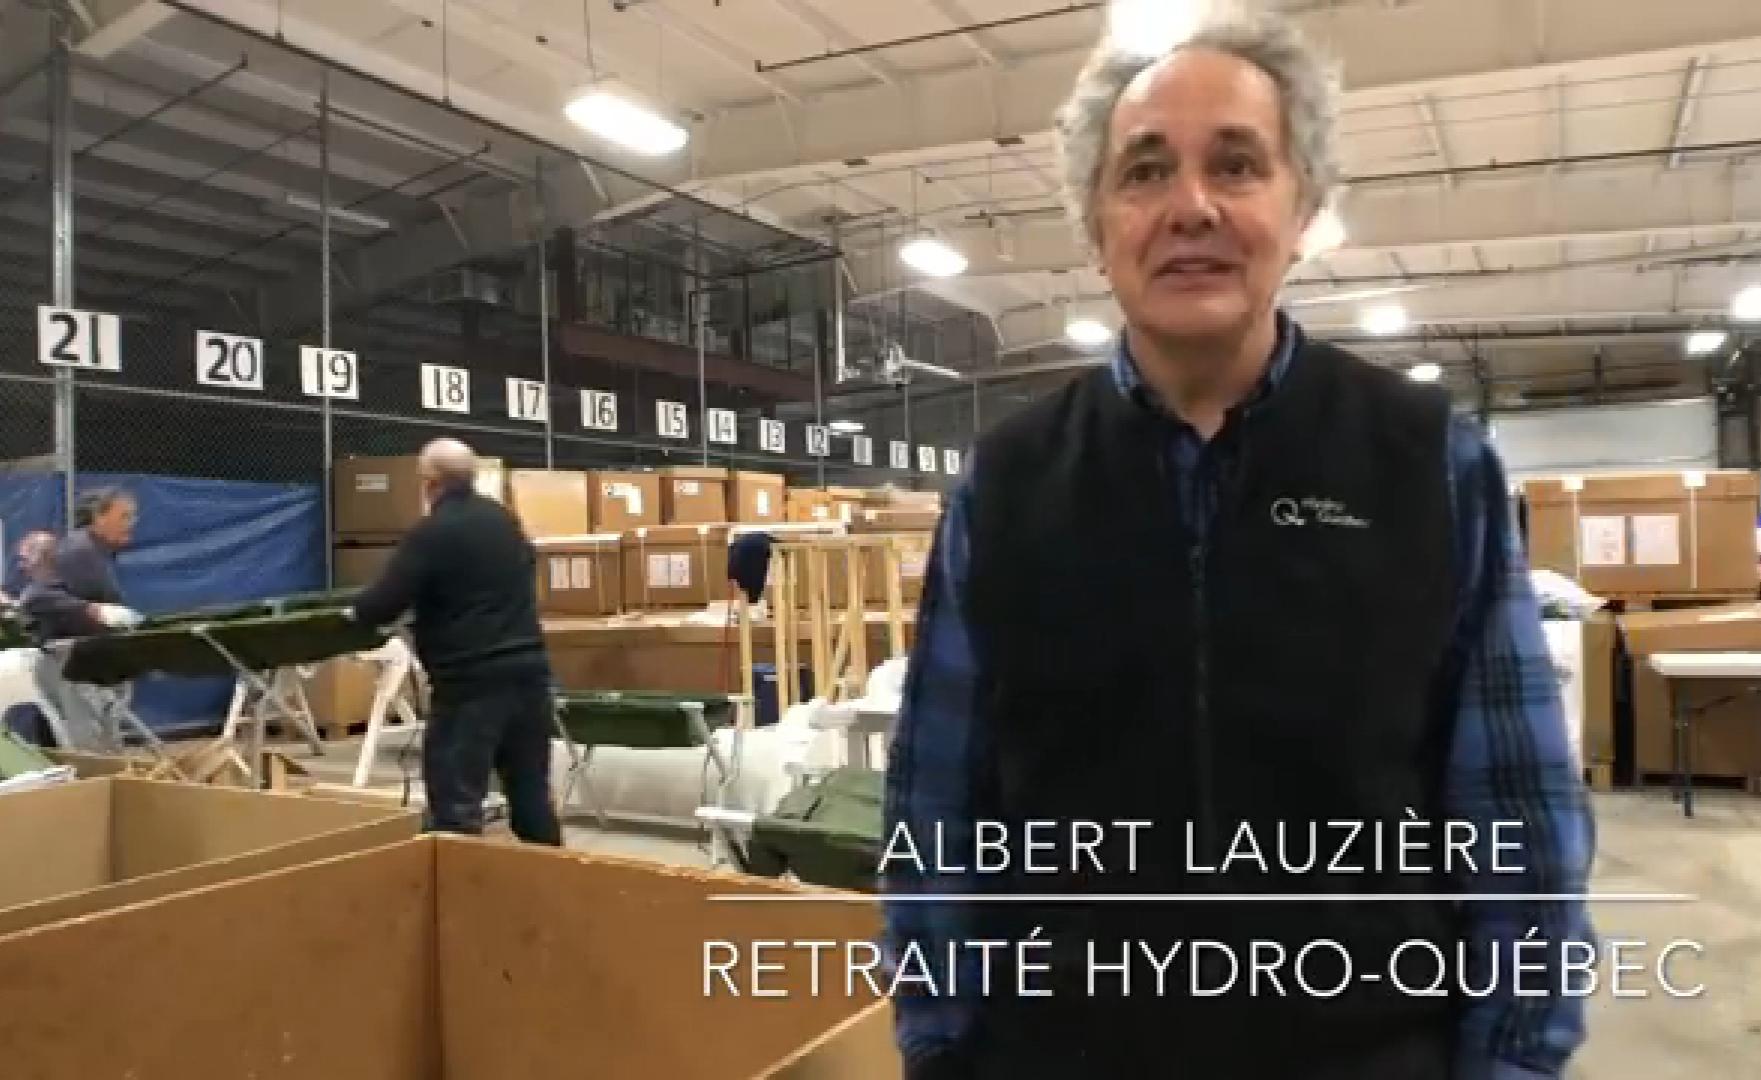 Albert Lauziere